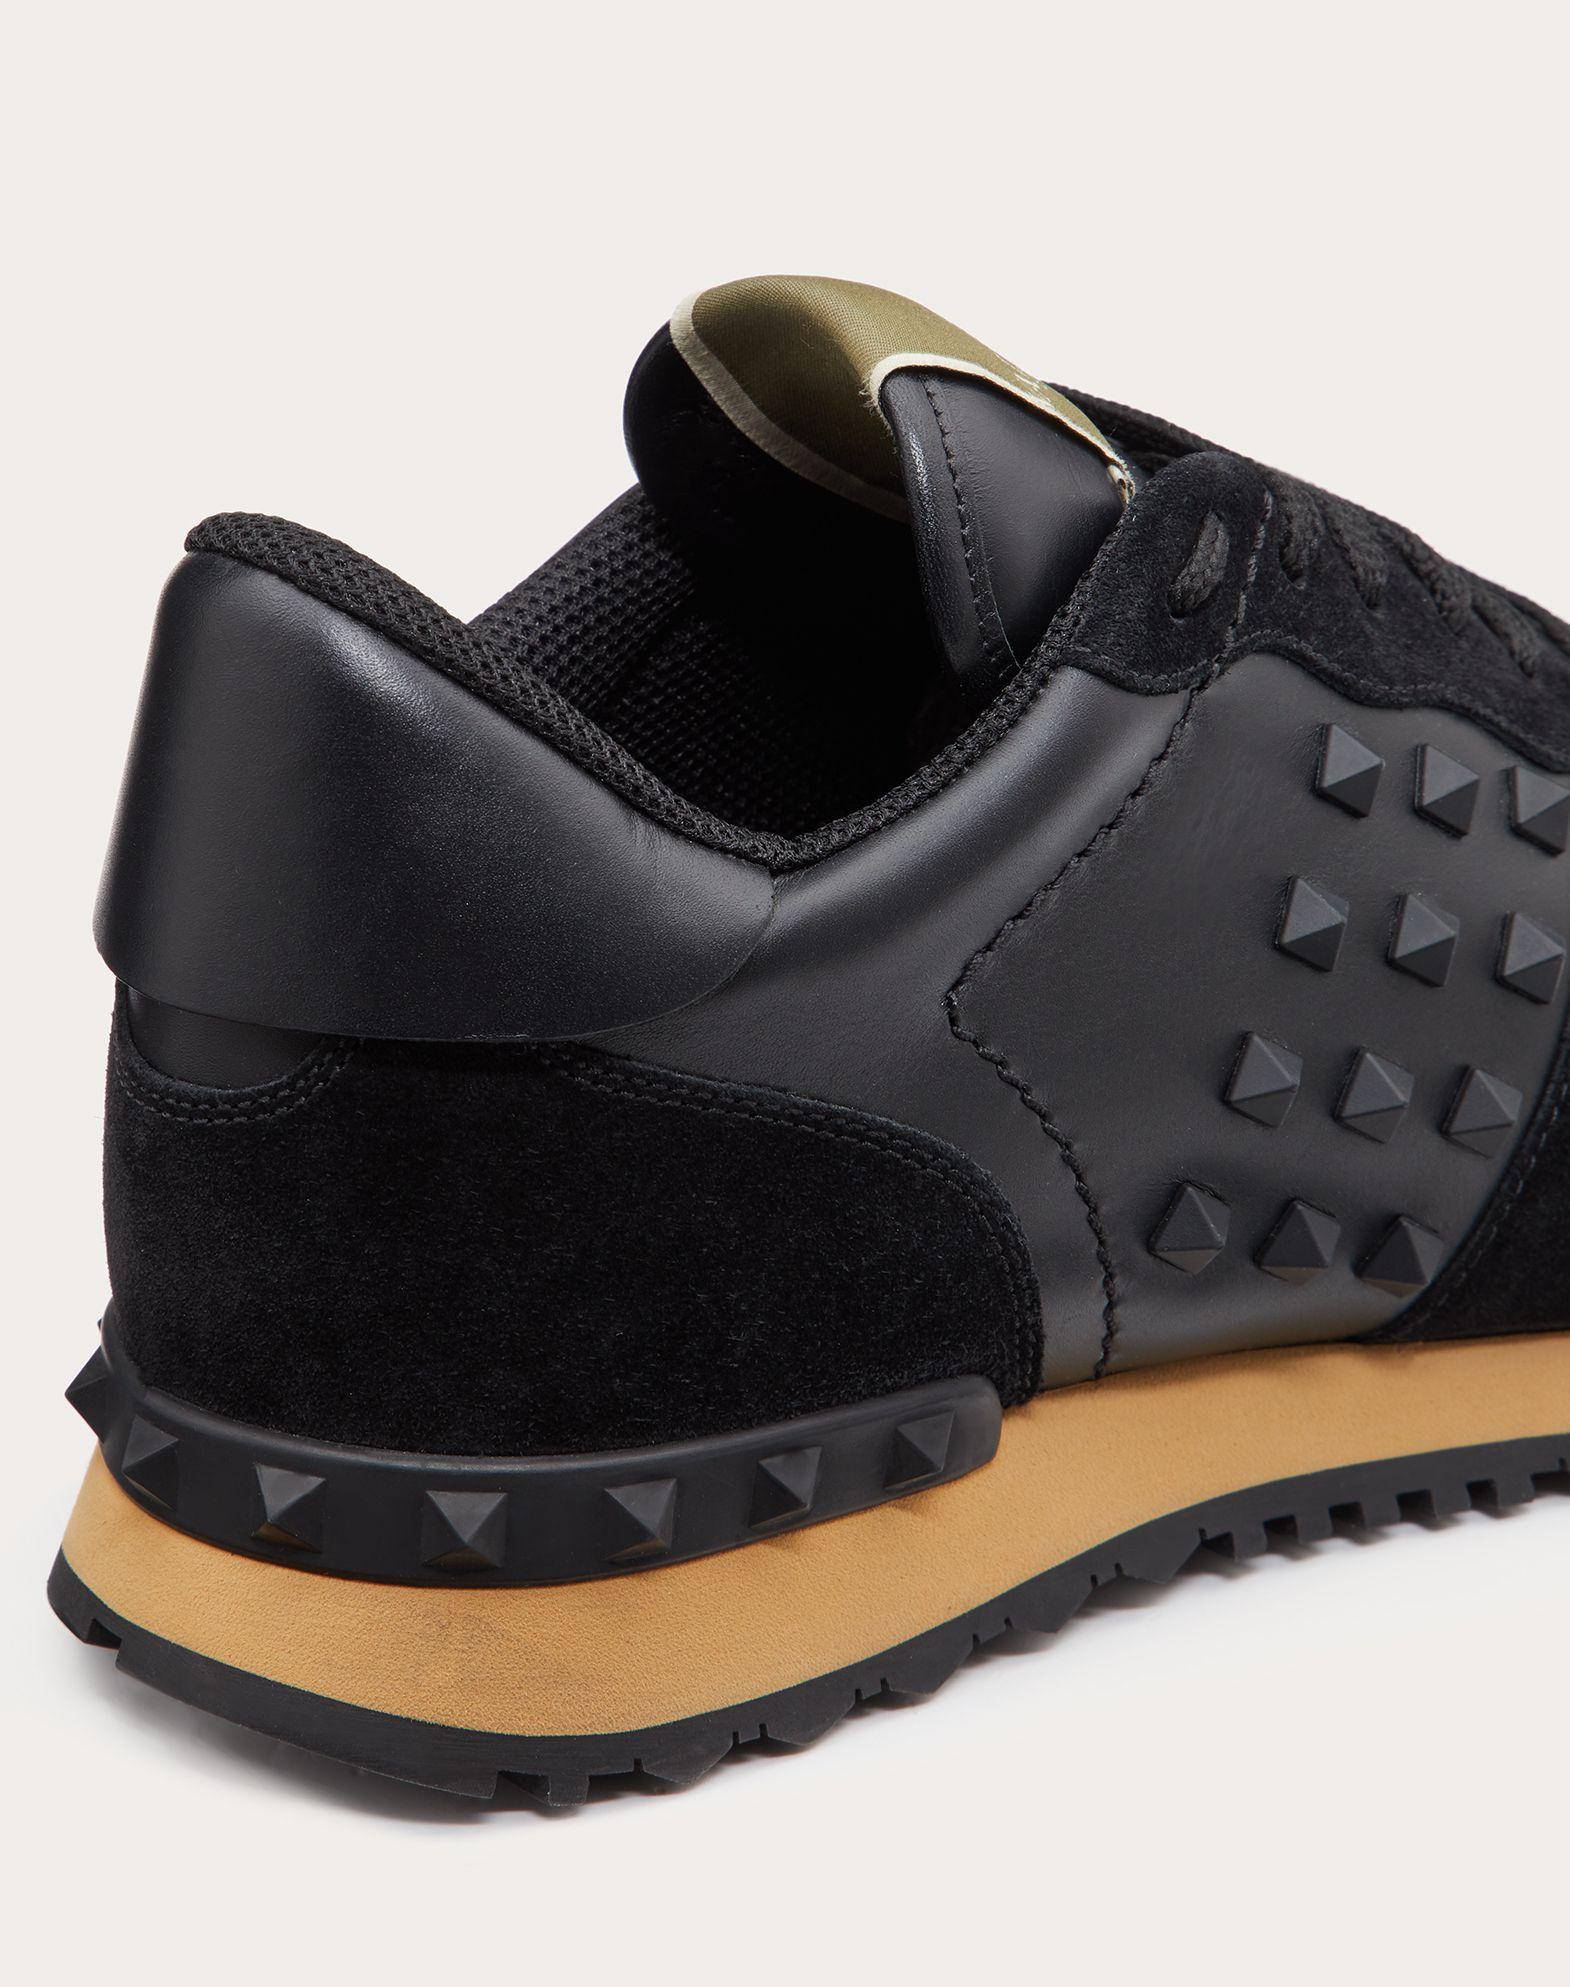 VALENTINO GARAVANI UOMO Rockstud 运动鞋 LOW-TOP SNEAKERS U a